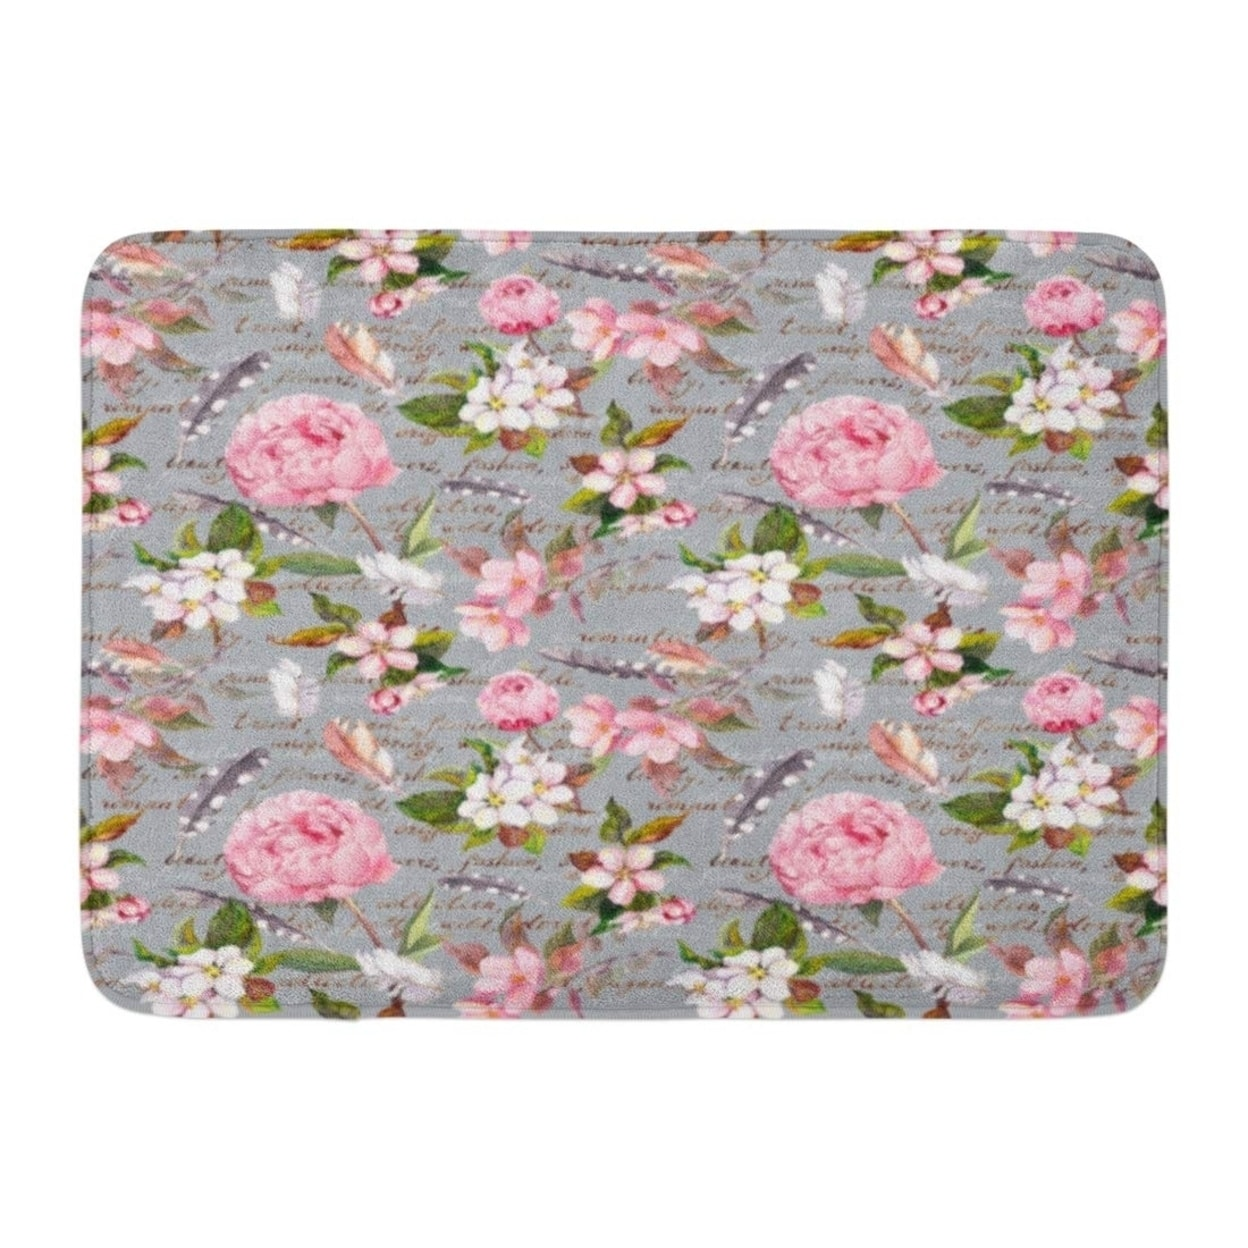 Pink Boho Peony Flowers Sakura Feathers Vintage Floral Pattern Letter Watercolor Botanic Doormat Floor Rug Bath Mat Multi On Sale Overstock 31777004